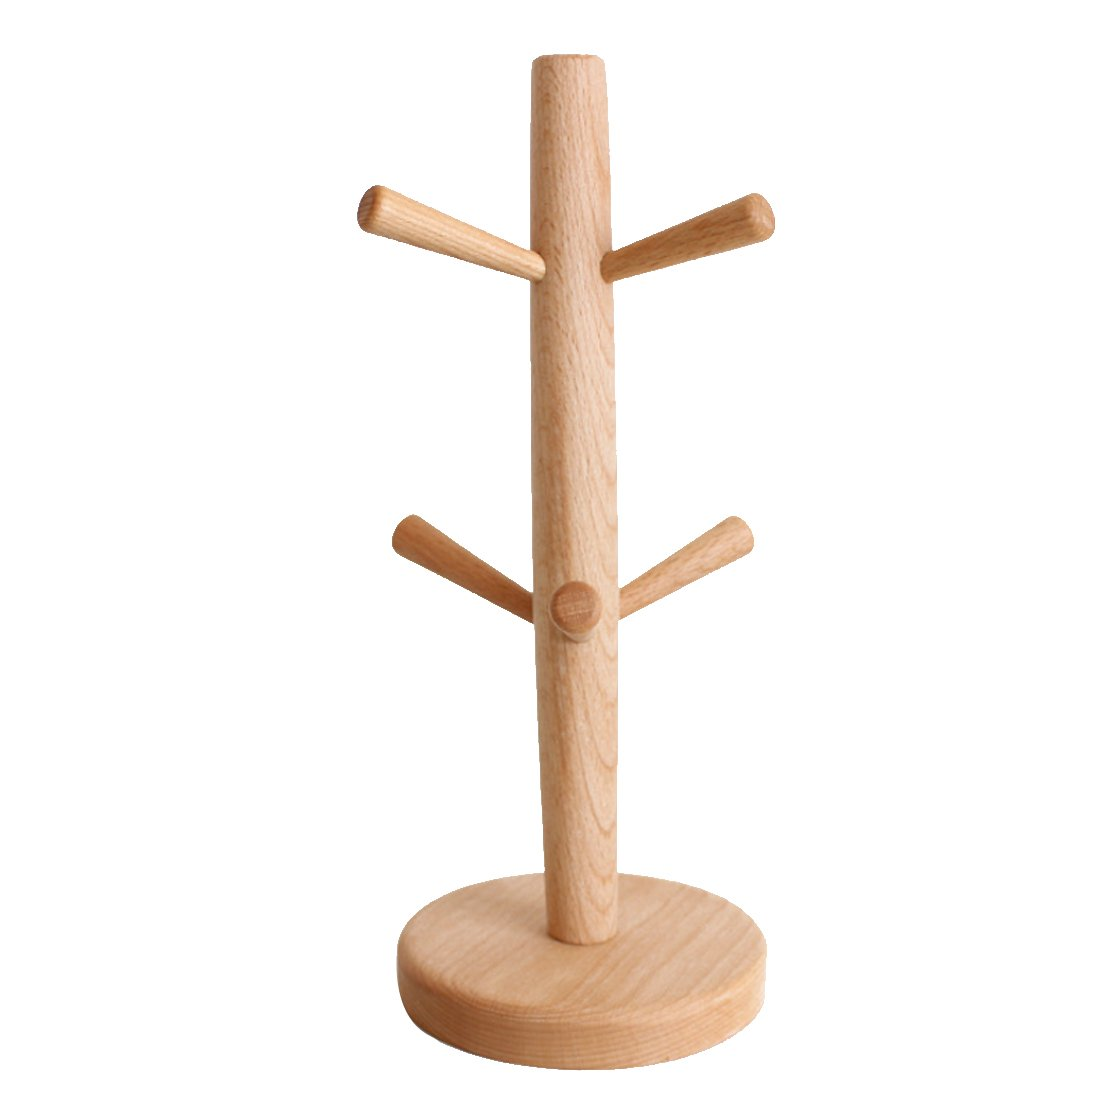 Haoun Wood Mug Rack Tree Storage Cup Organizer Holder with 6 Hooks-Round Base